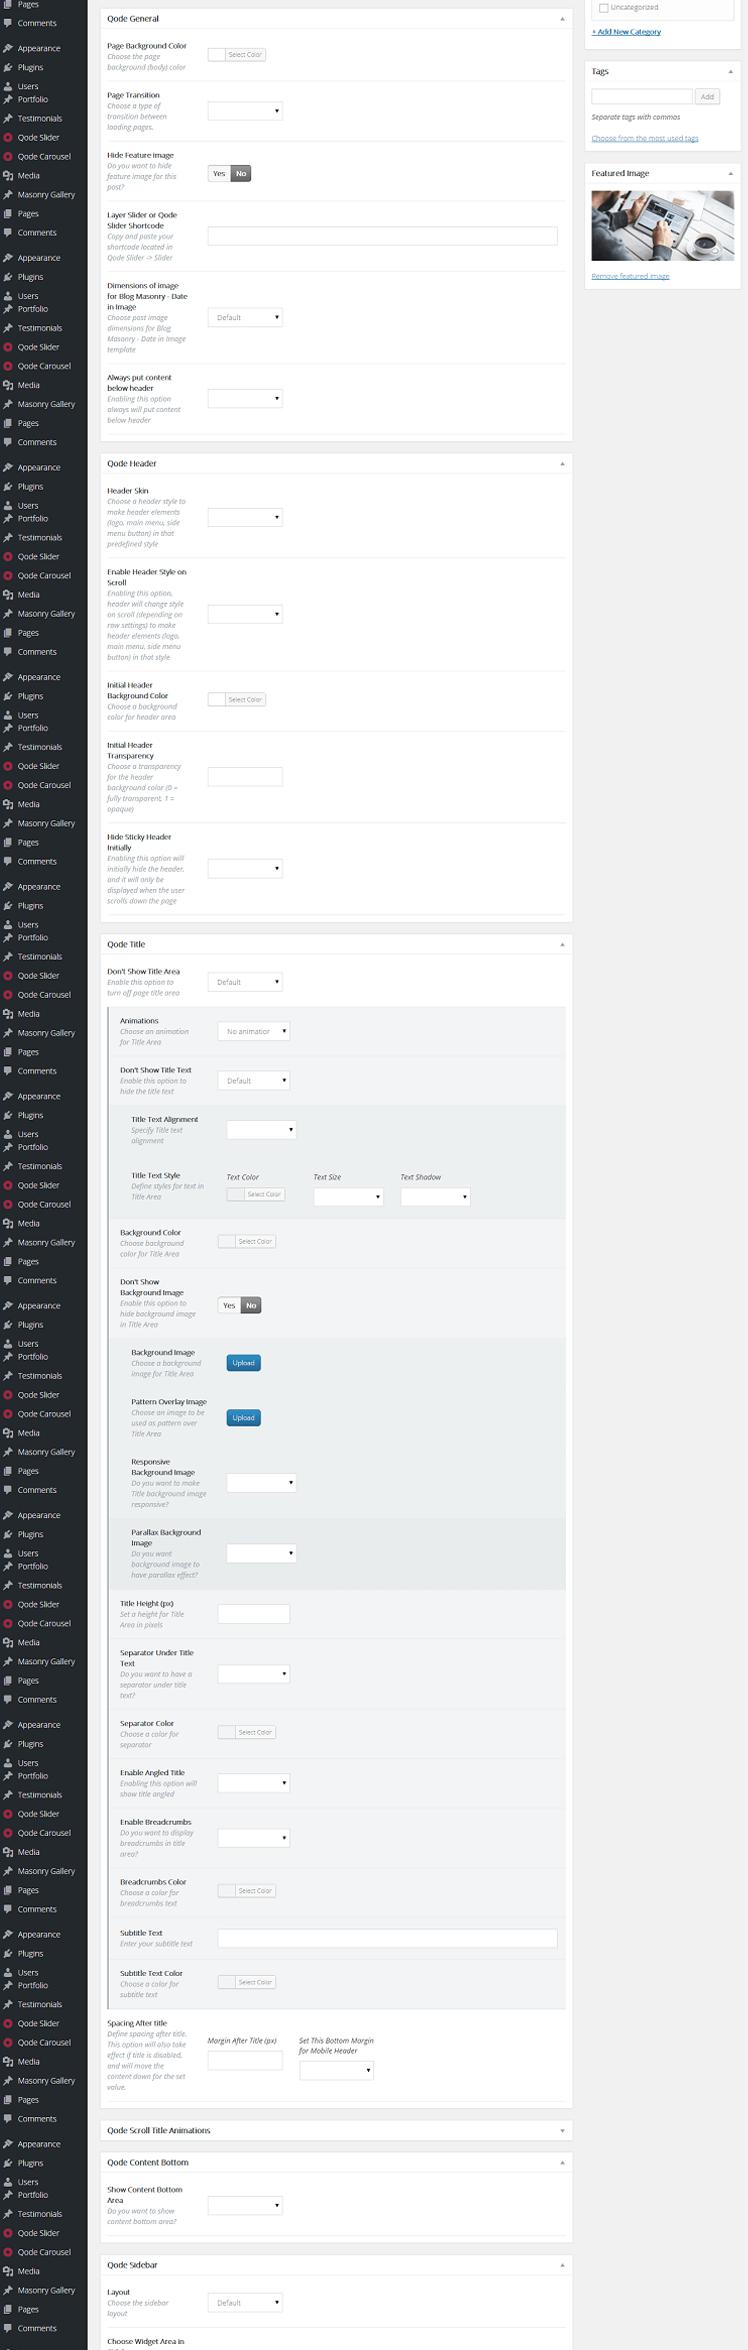 Creative, Unique, Simple, Efficient wordpress theme bridge 9